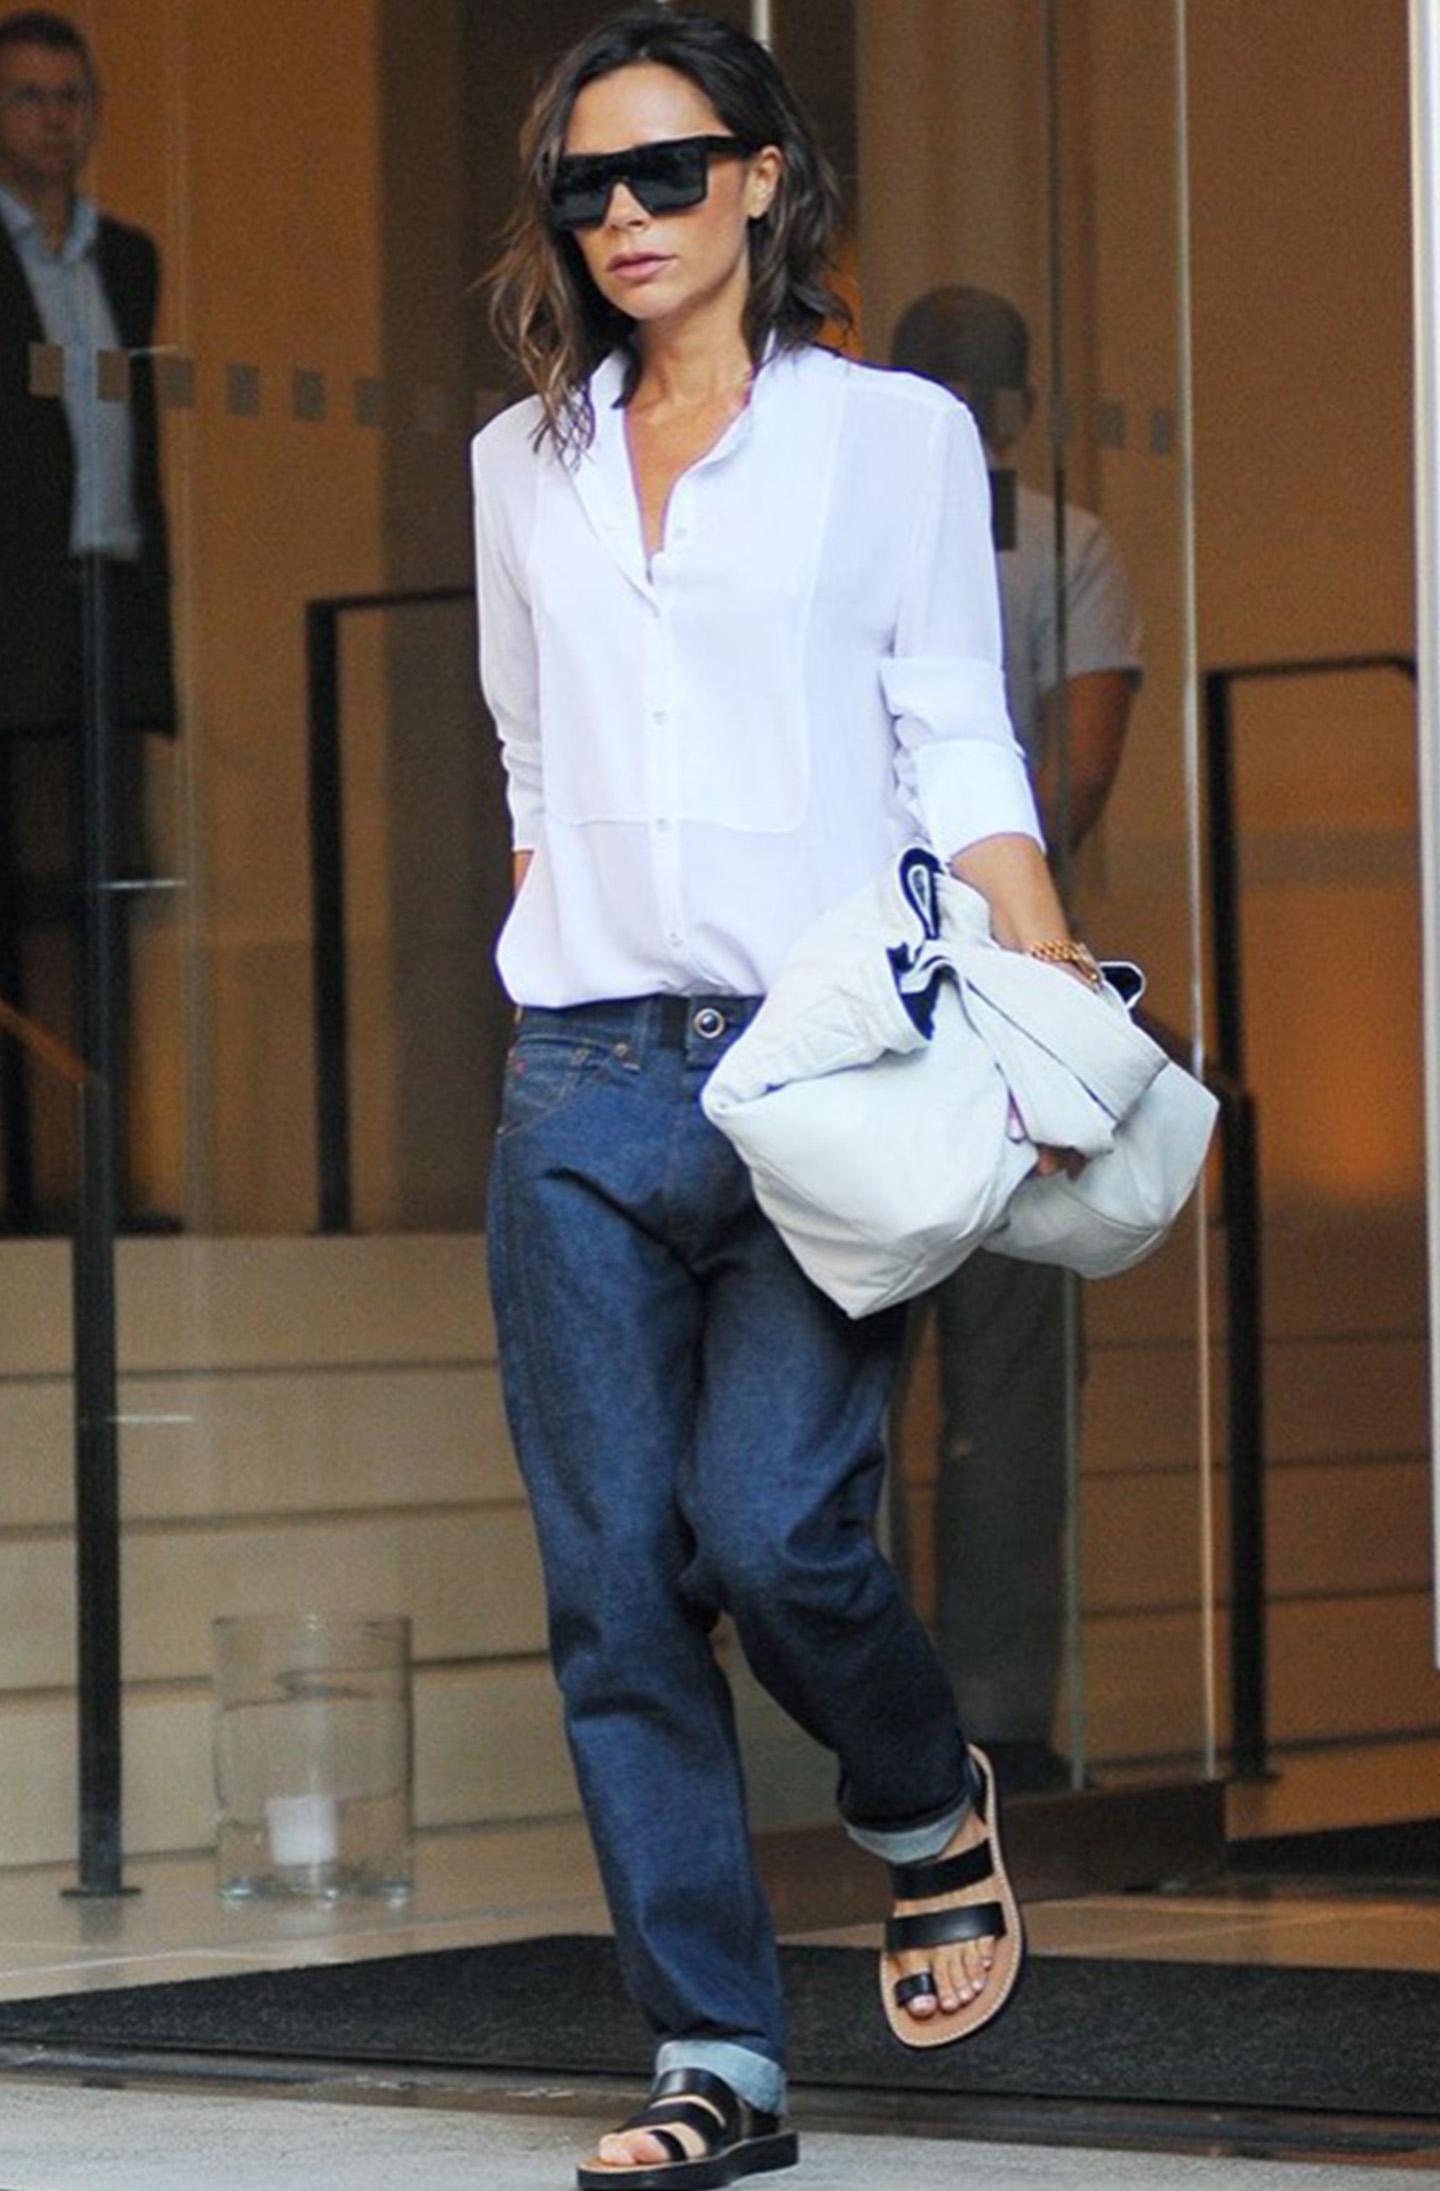 Victoria Beckham jeans - Neomag.